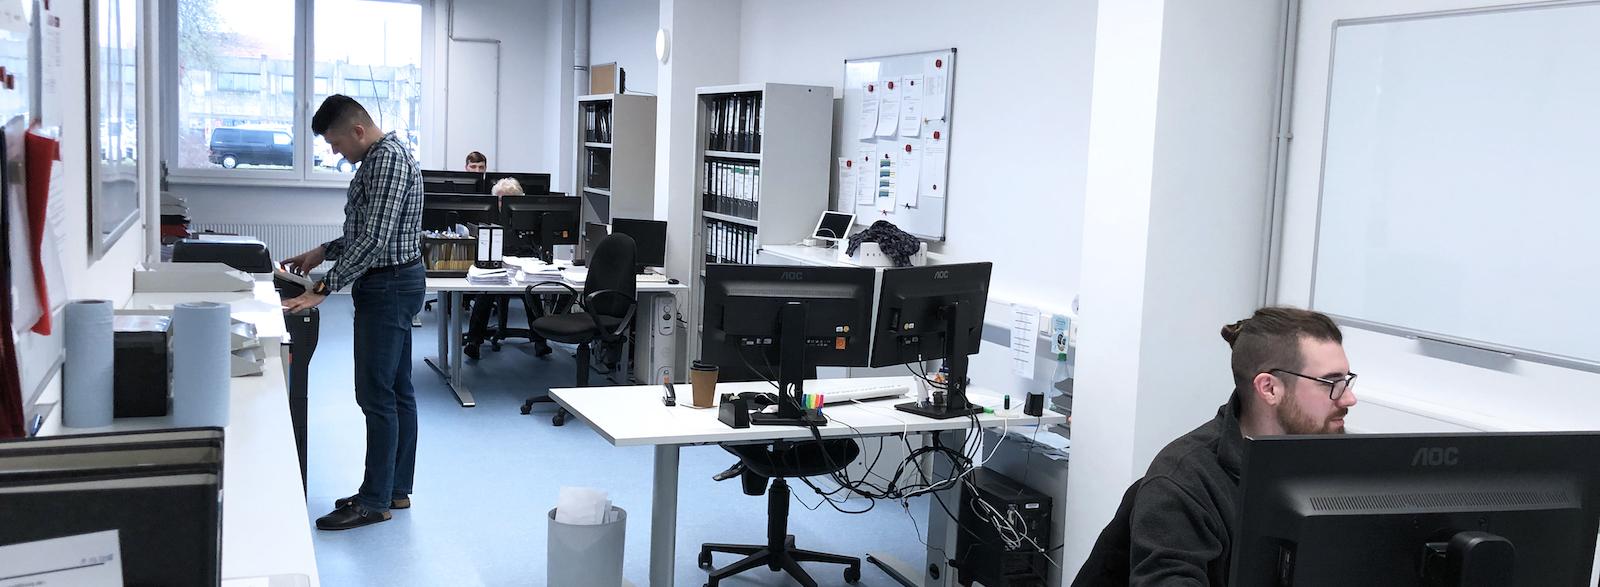 Verwaltung bei DSI-pharm